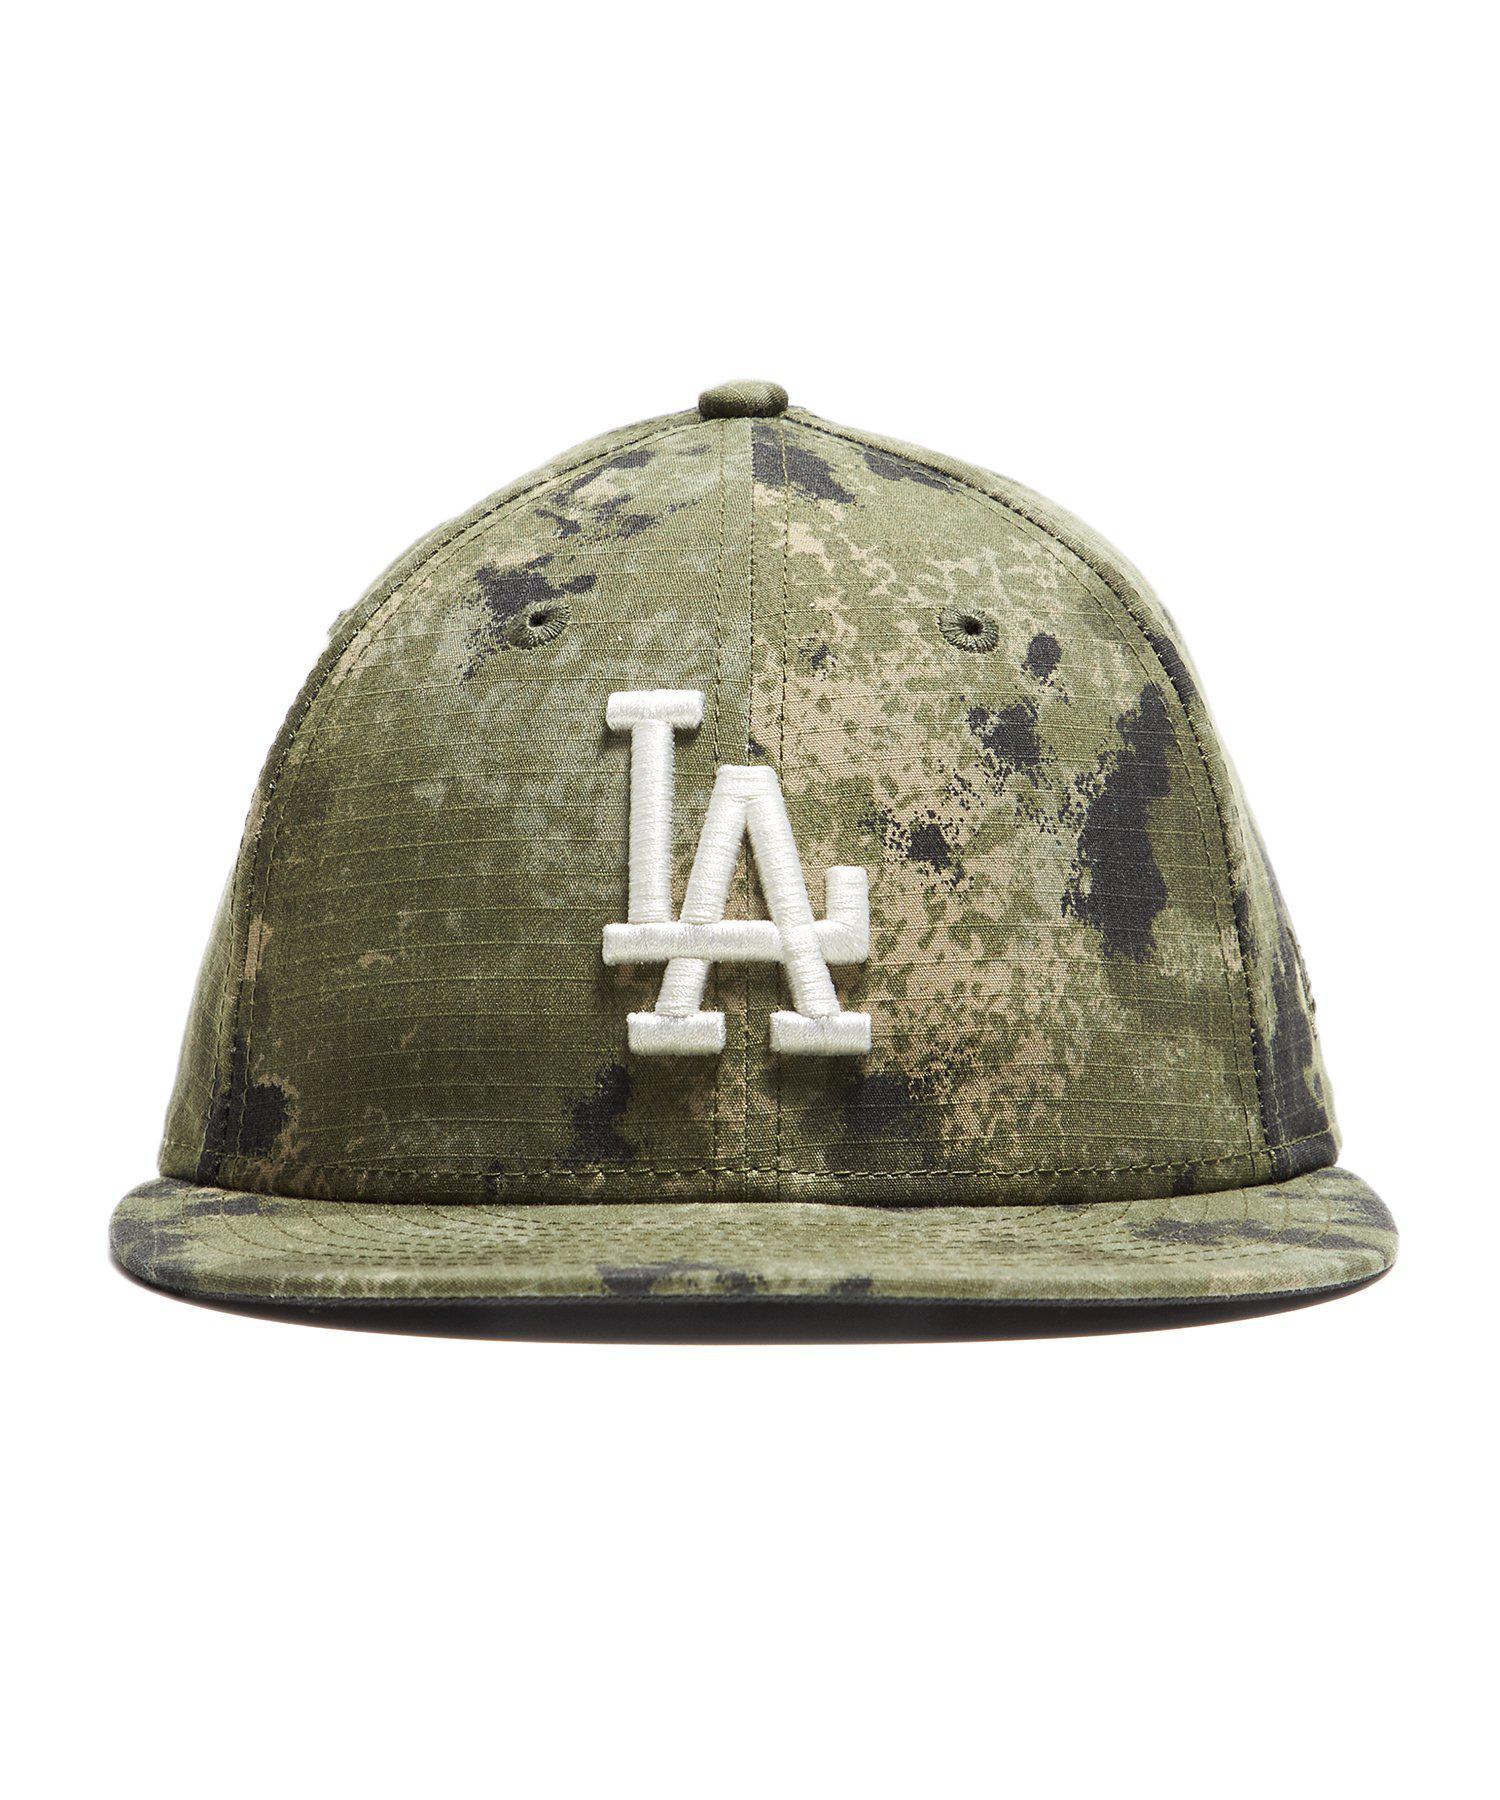 770b293f7b2 Lyst - NEW ERA HATS La Dodgers Cap In Camo Ripstop in Green for Men